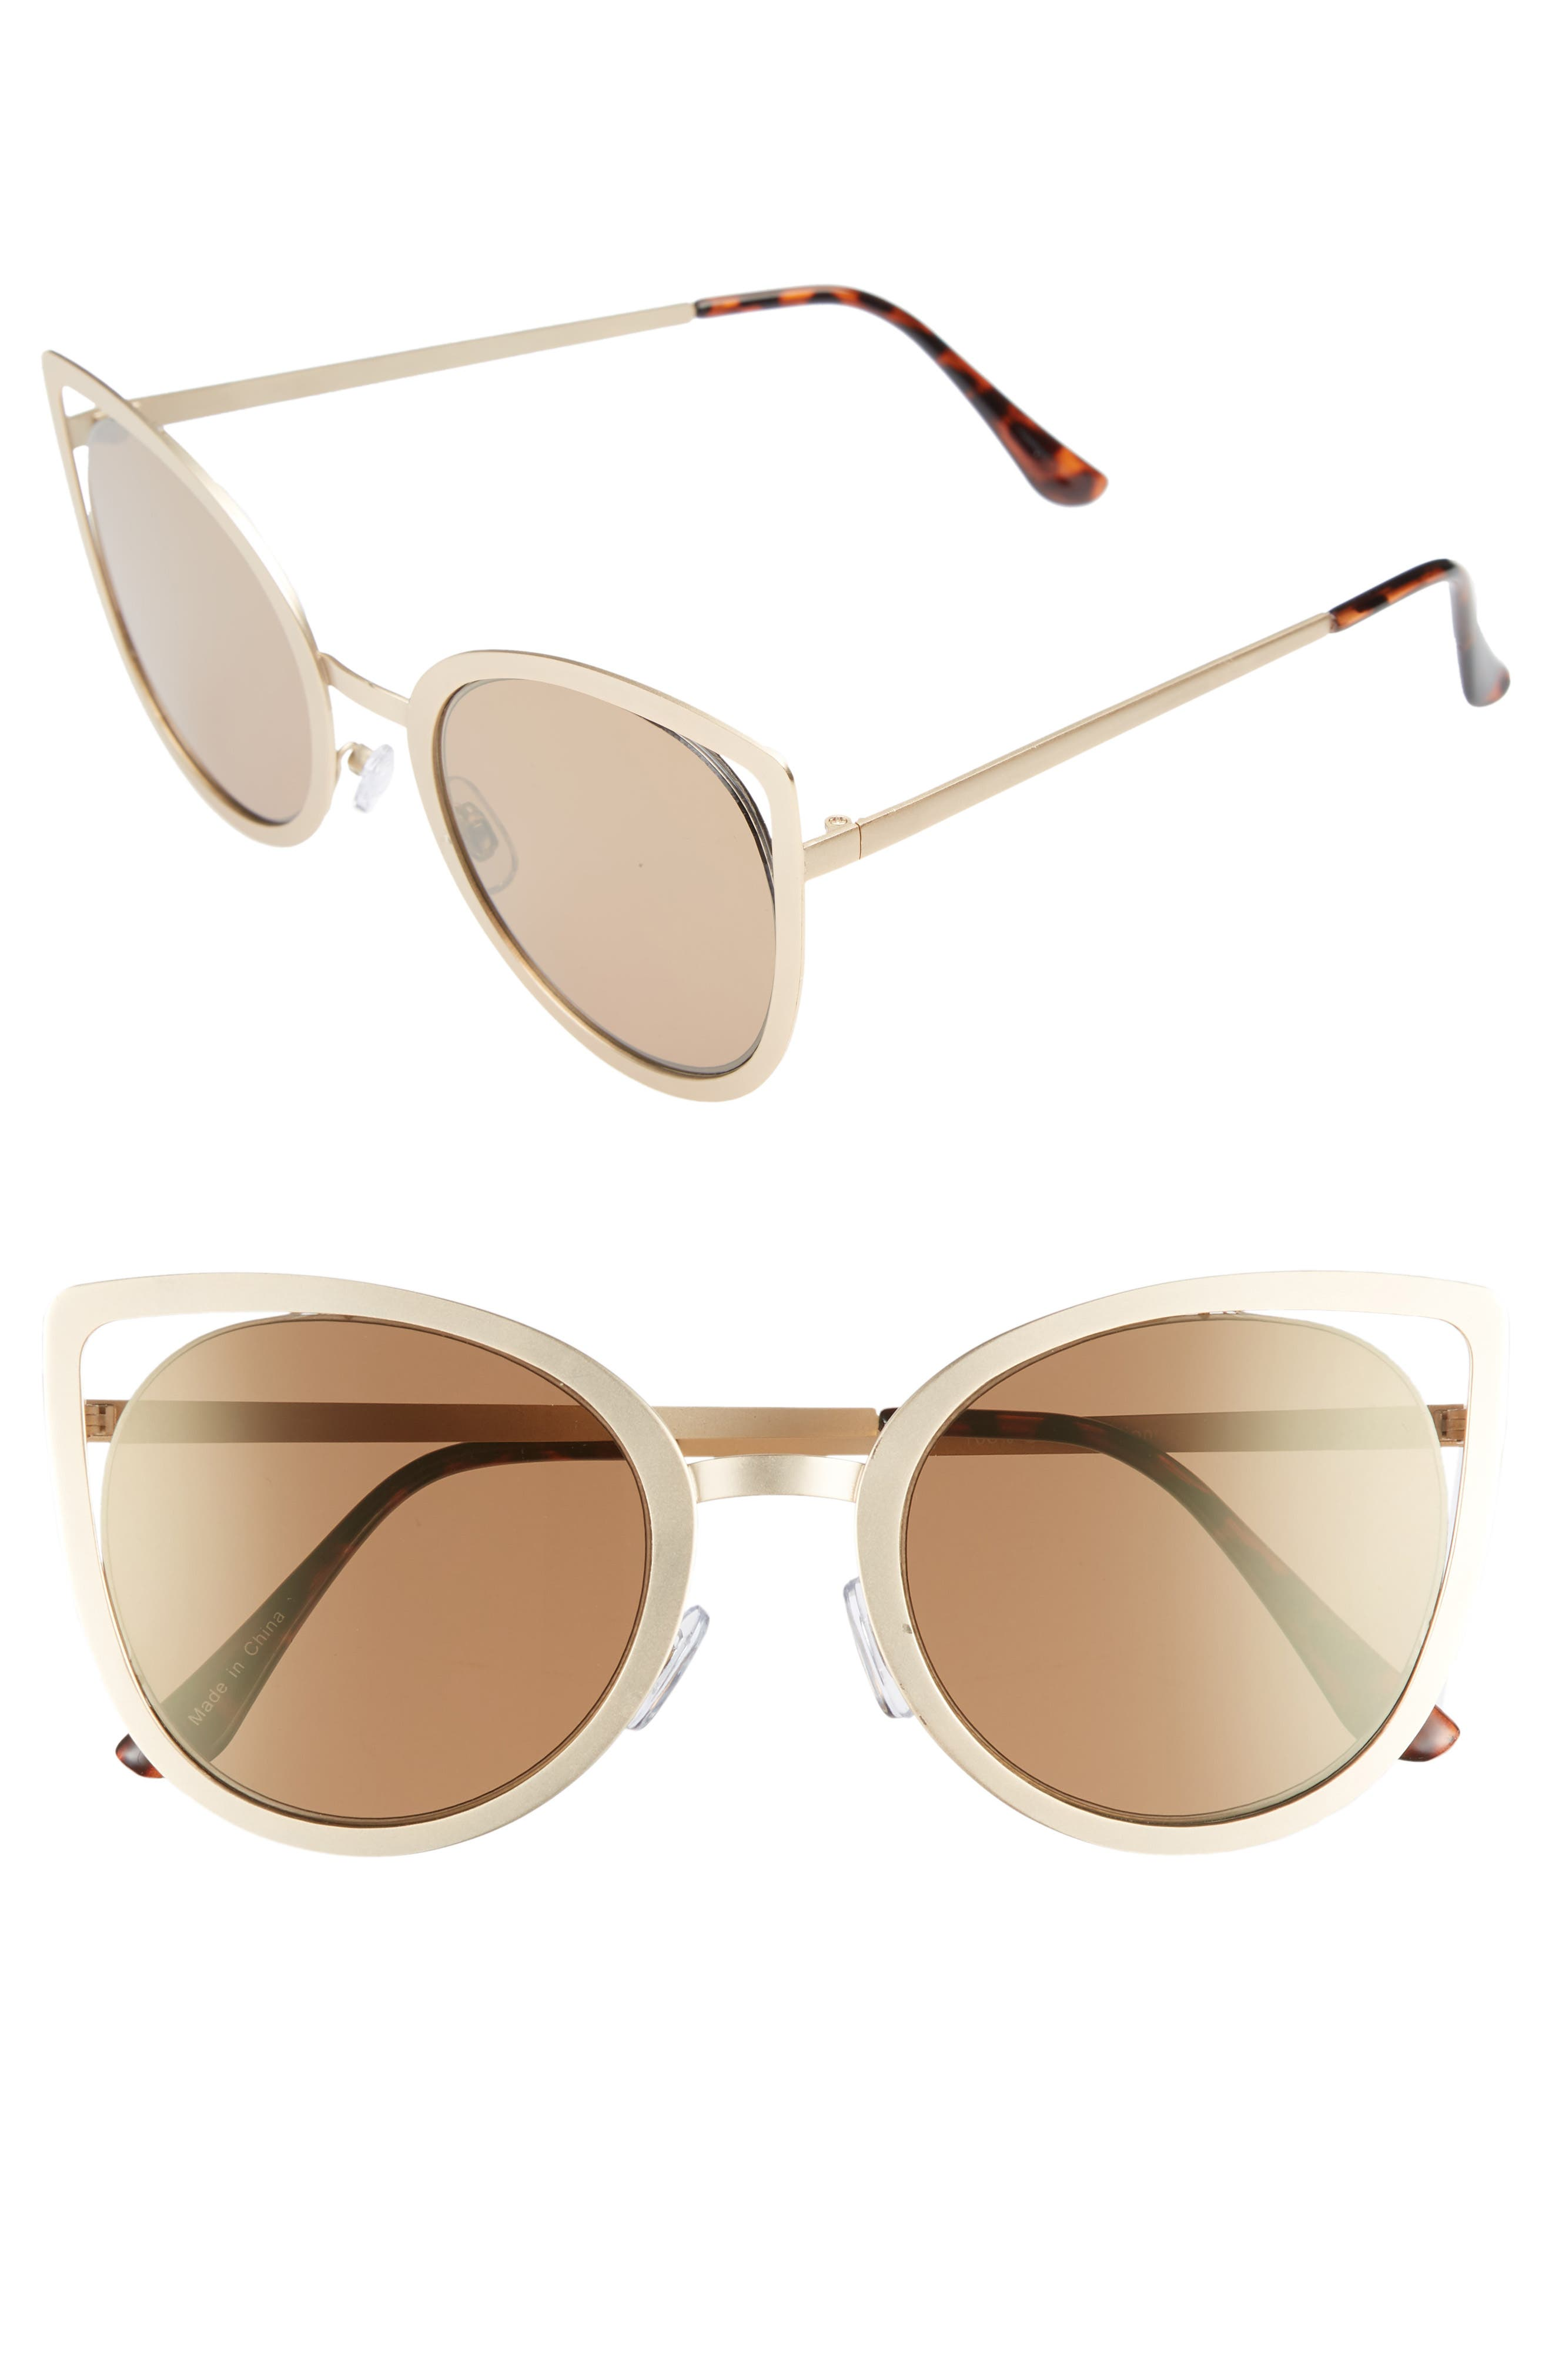 53mm Cutout Cat Eye Sunglasses,                         Main,                         color, Gold